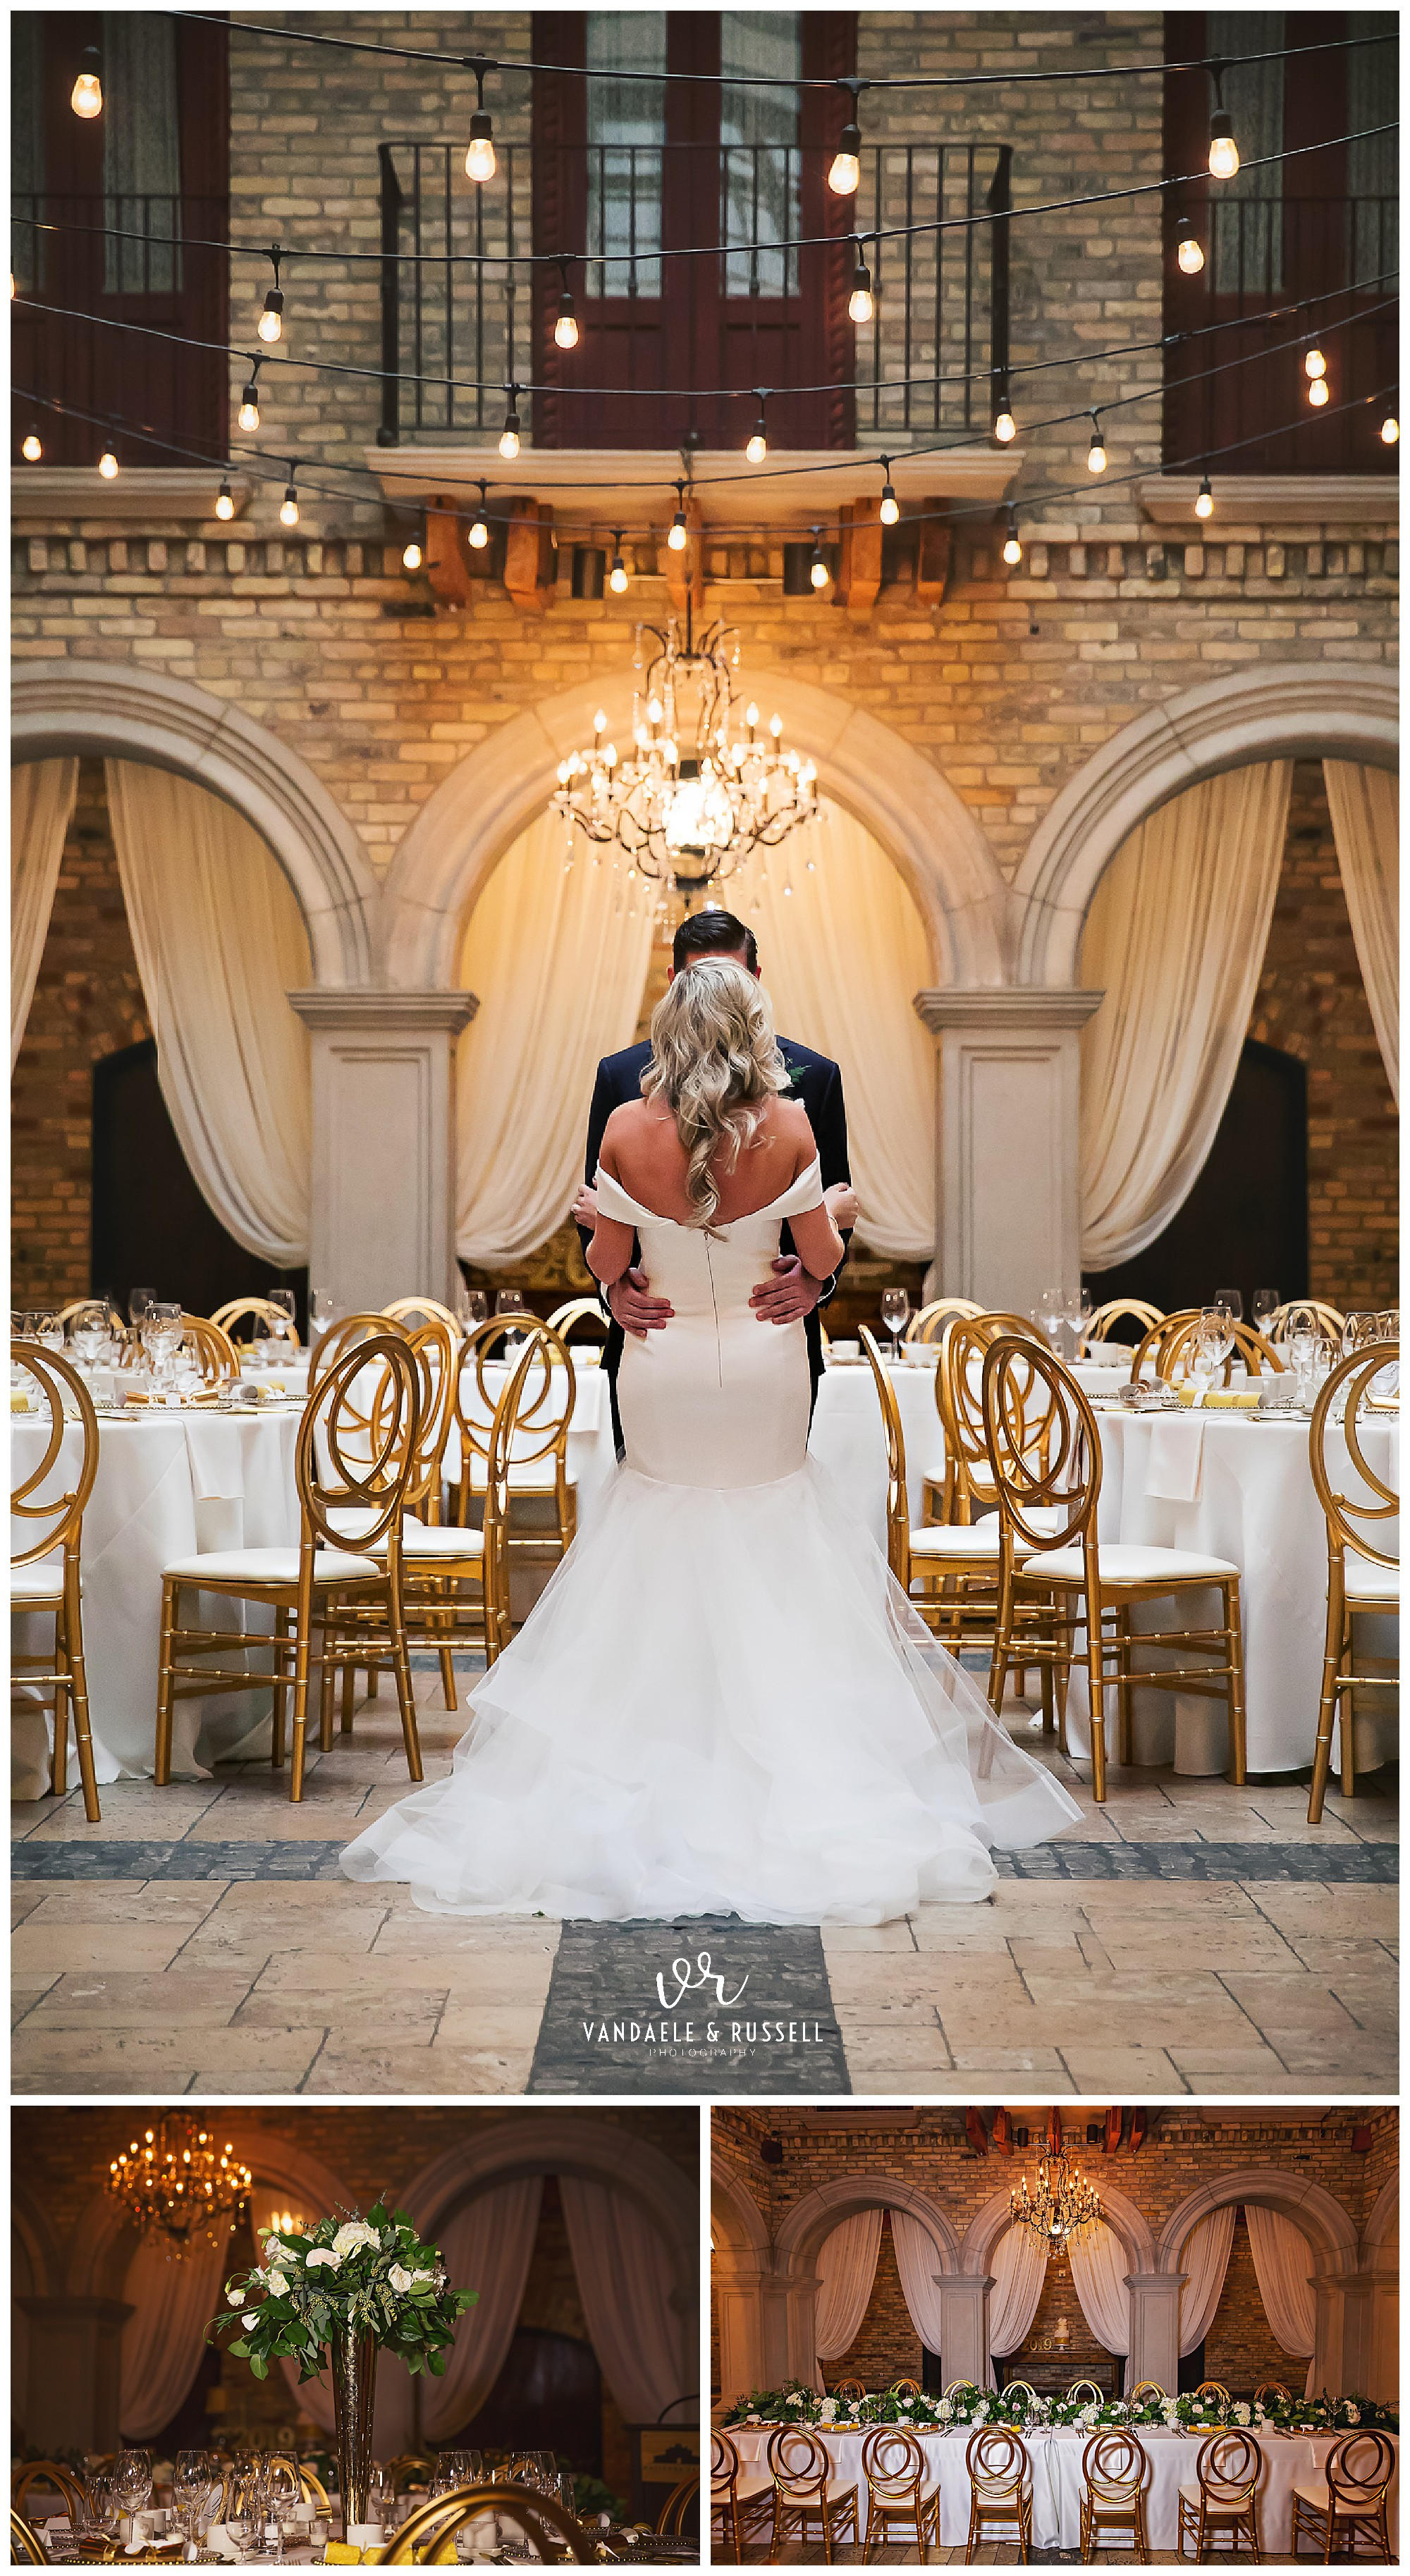 Hacienda-Sarria-Wedding-Photos-NYE-Michelle-Matt-VanDaele-Russell_0014.jpg